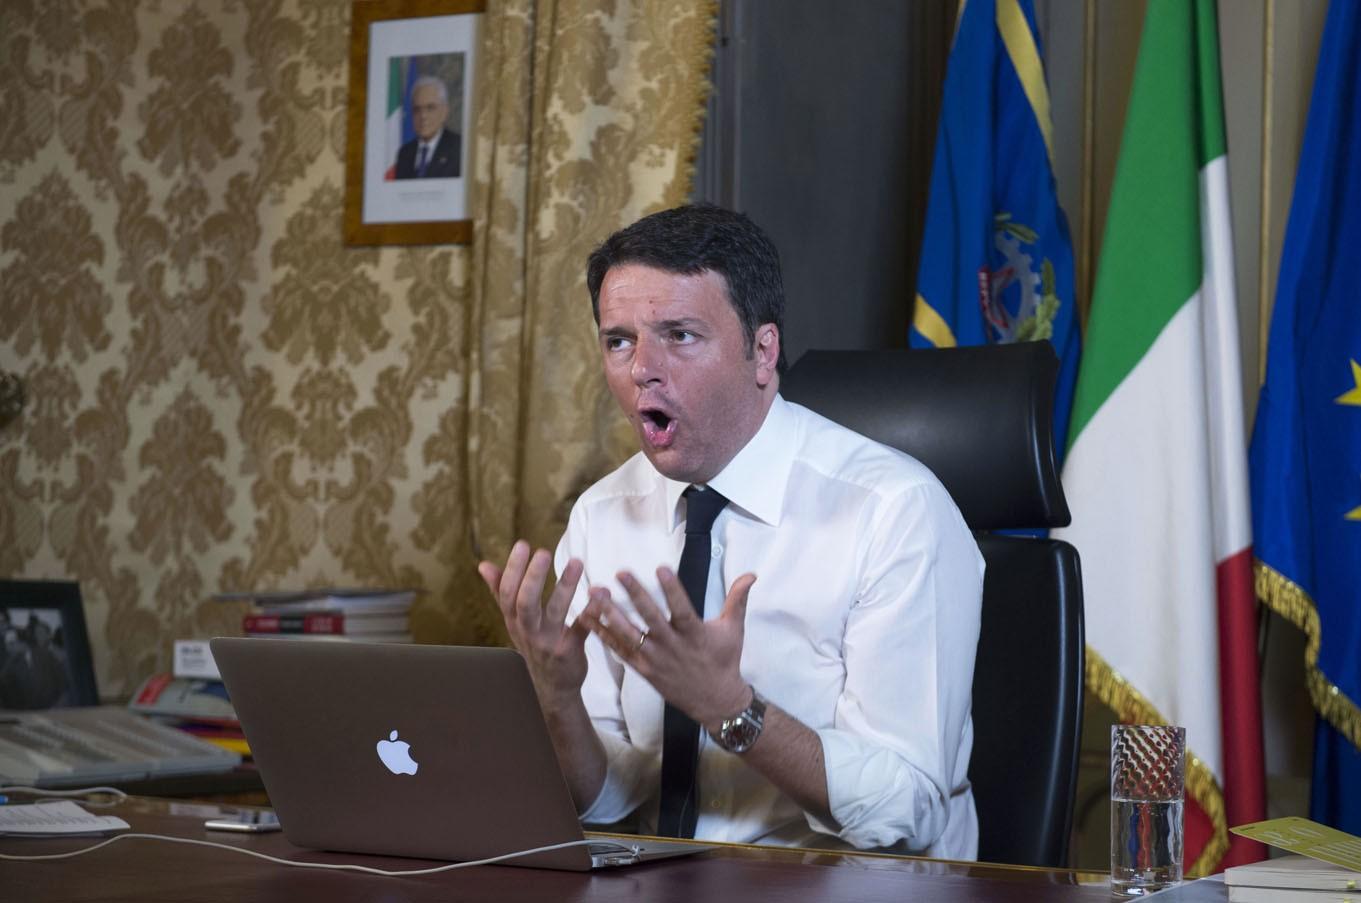 Matteo Renzi denunciato Codacons per pubblicita occulta ad Apple - #matteorisponde Matteo Renzi denunciato dal Codacons per pubblicità occulta ad Apple